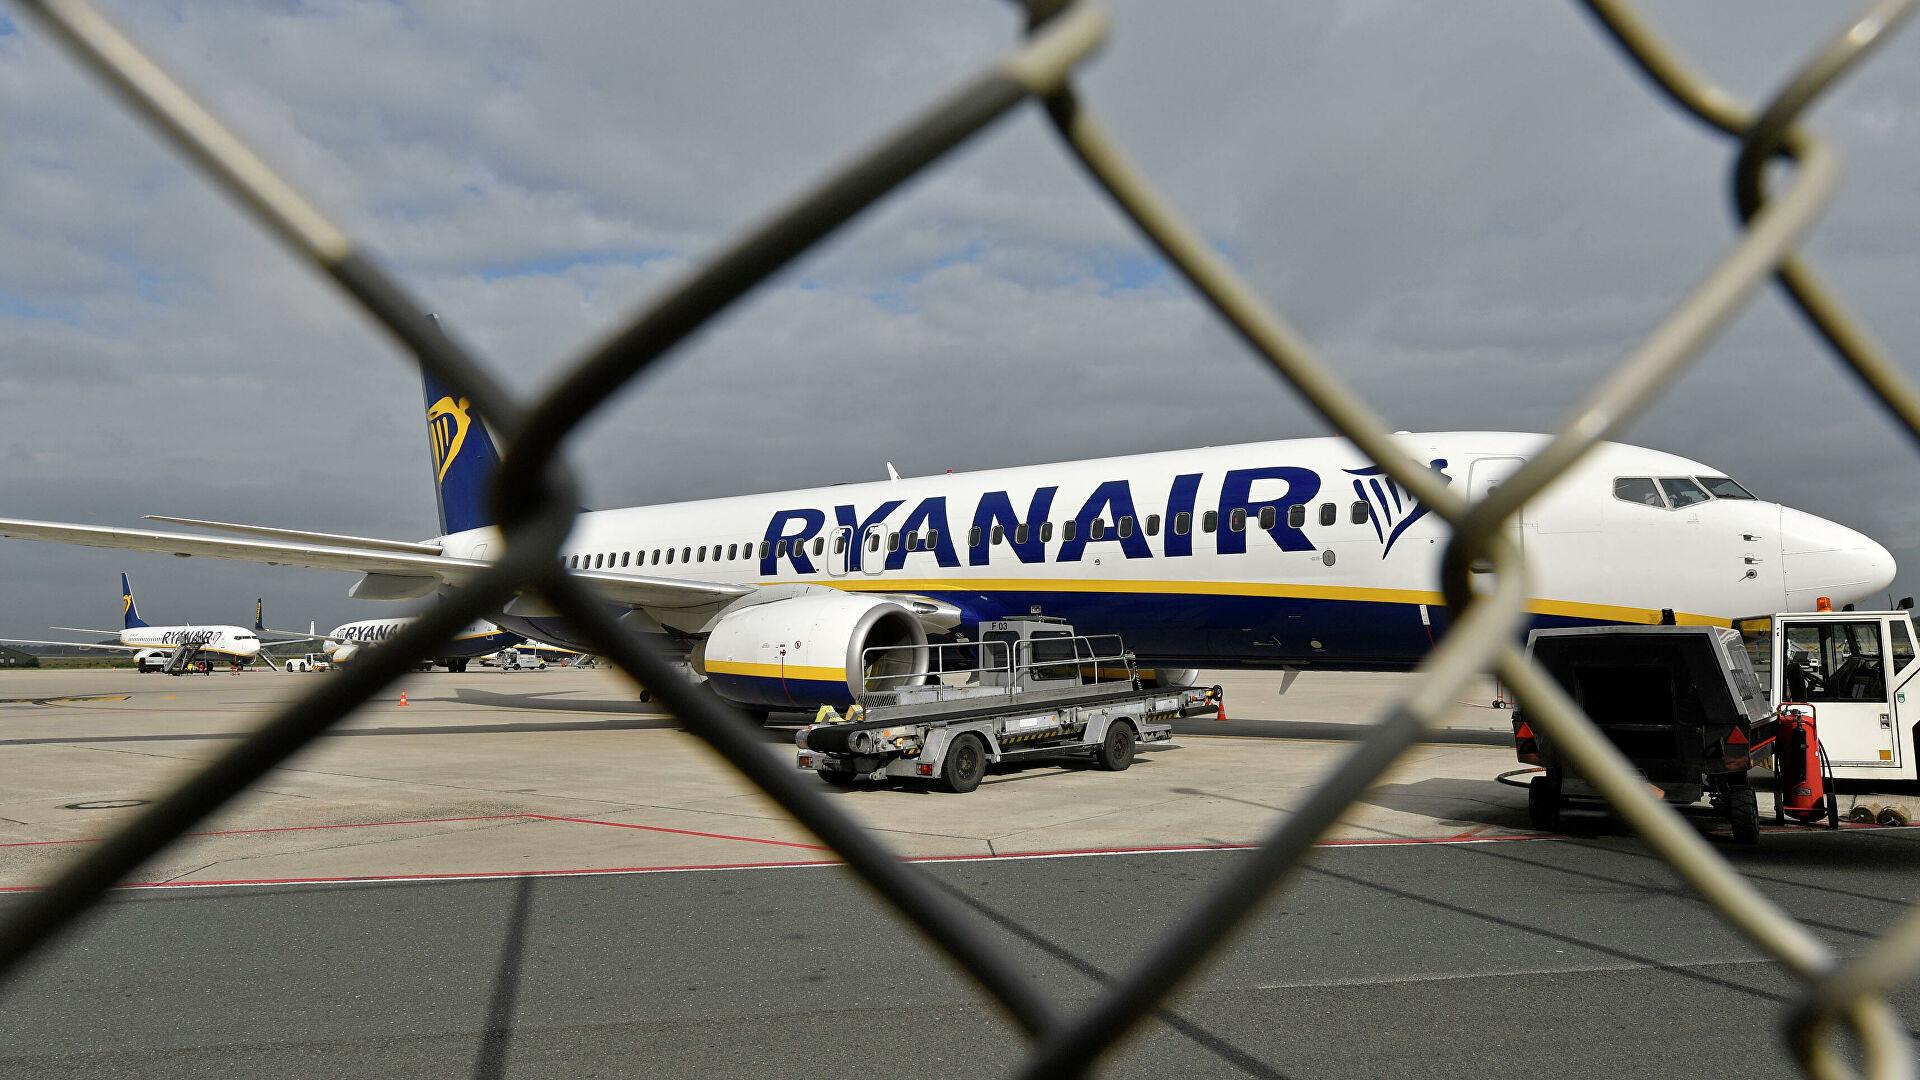 МИД назвал реакцию Запада на инцидент с самолетом в Минске истерикой